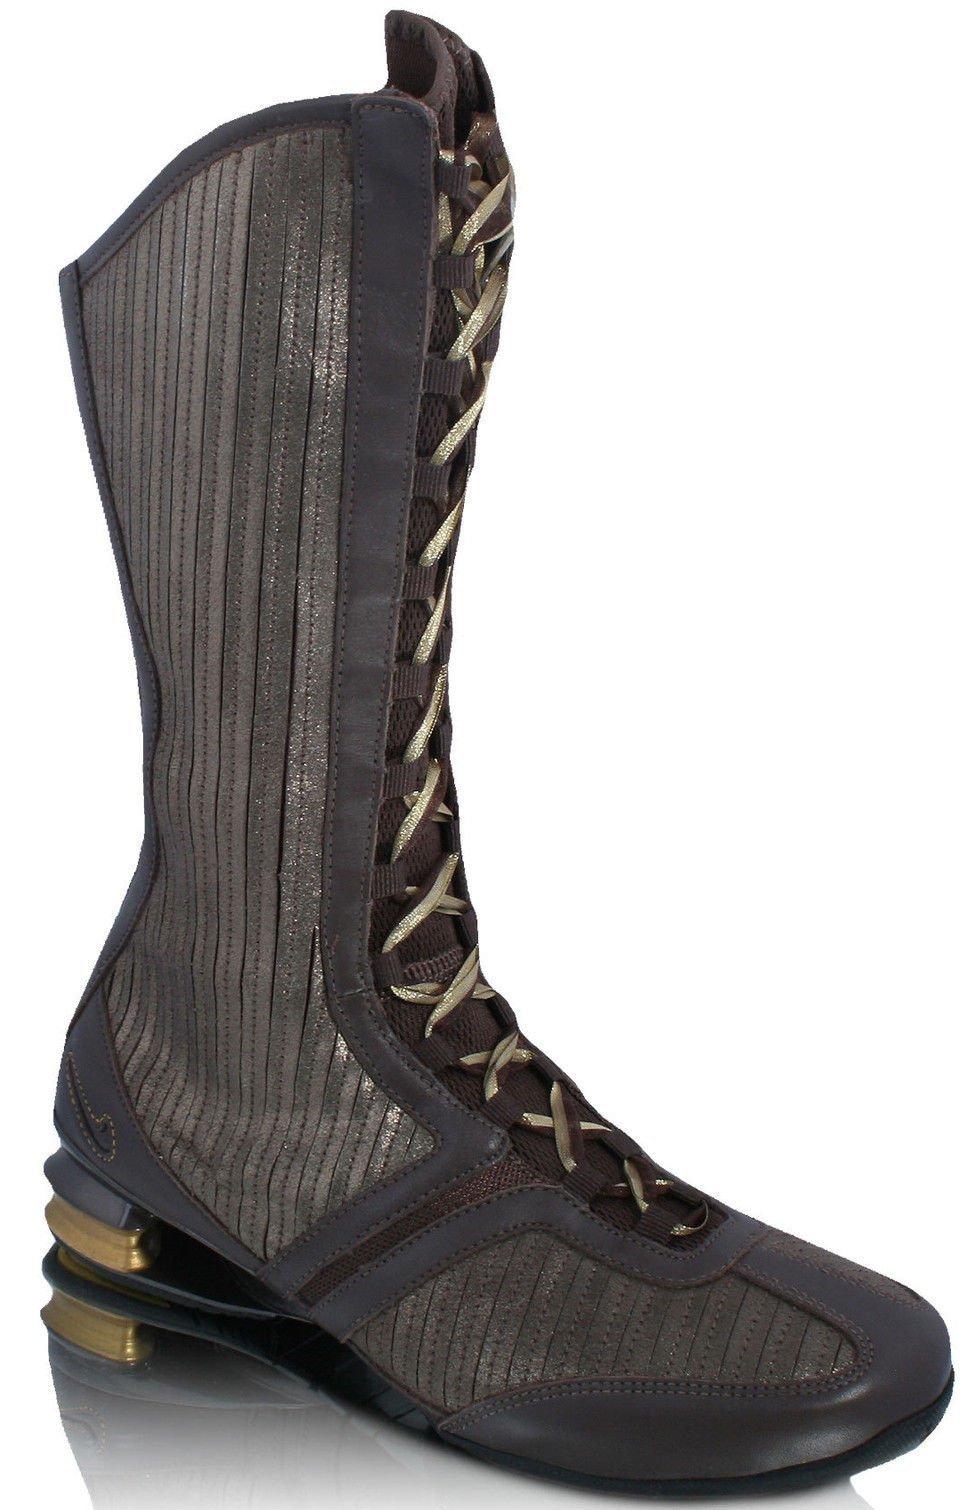 Nike Shox Q´Vida Hi Summer boots brown / gold RARE !!!, EU Shoe Size:EUR 36.5